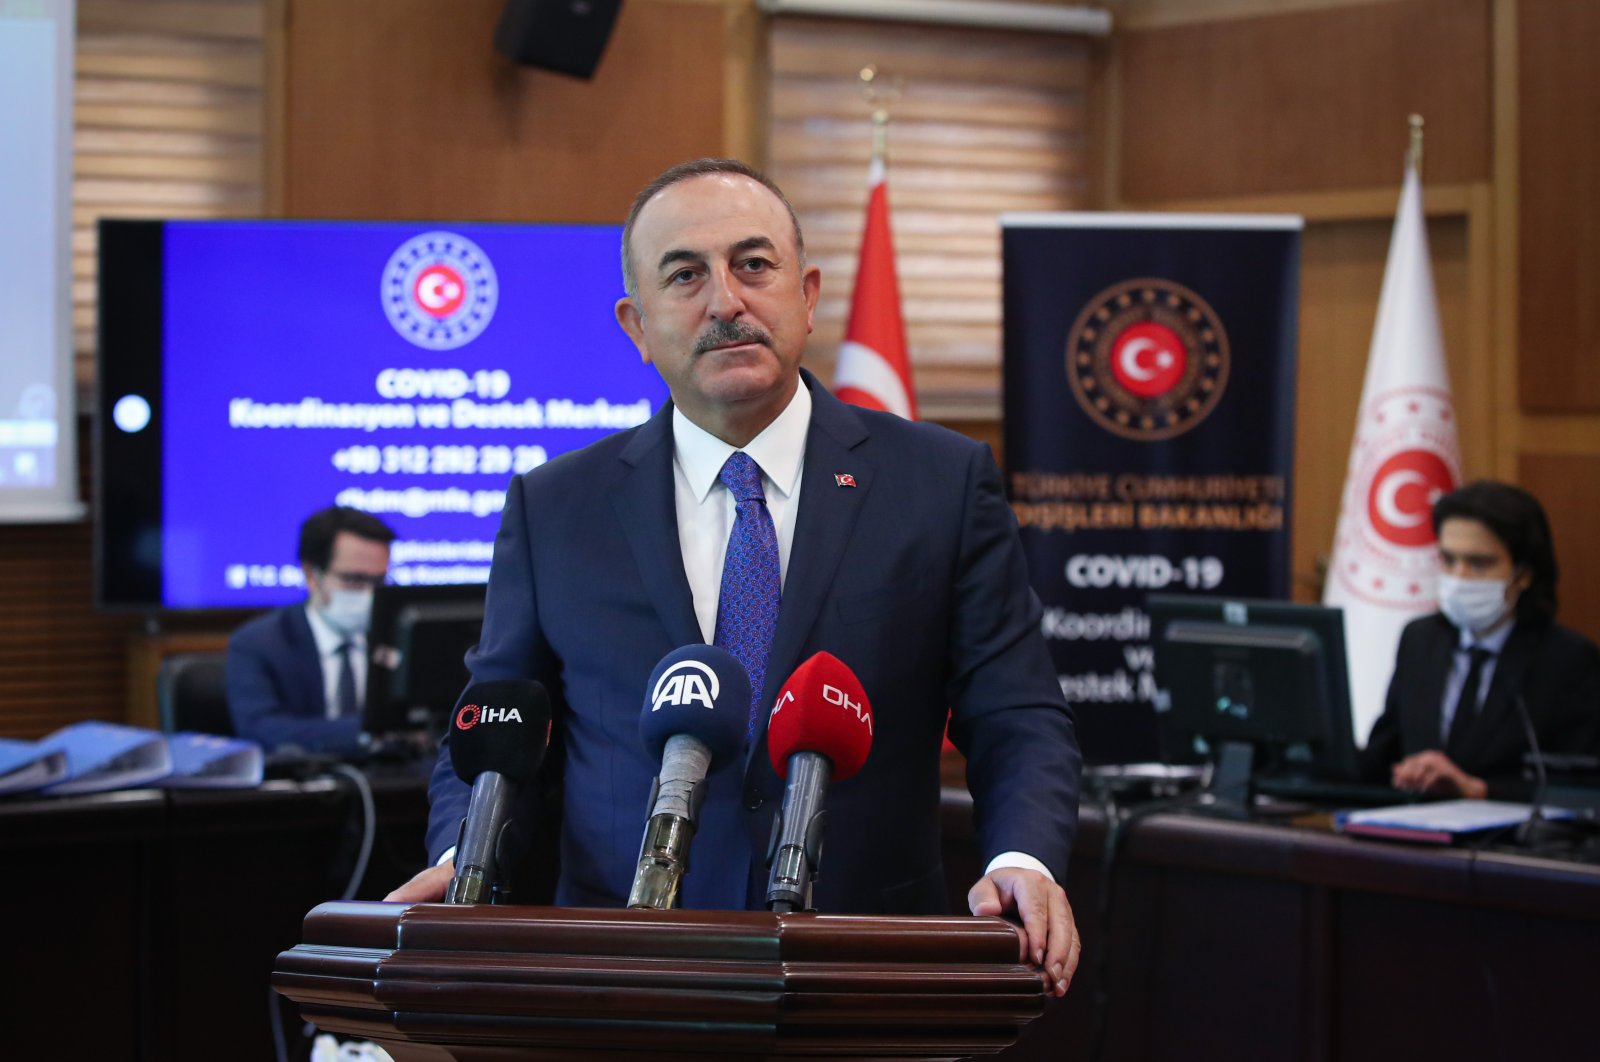 Foreign Minister Mevlüt Çavuşoğlu speaks at a news conference in Ankara, Turkey, May 5, 2020. (AA Photo)